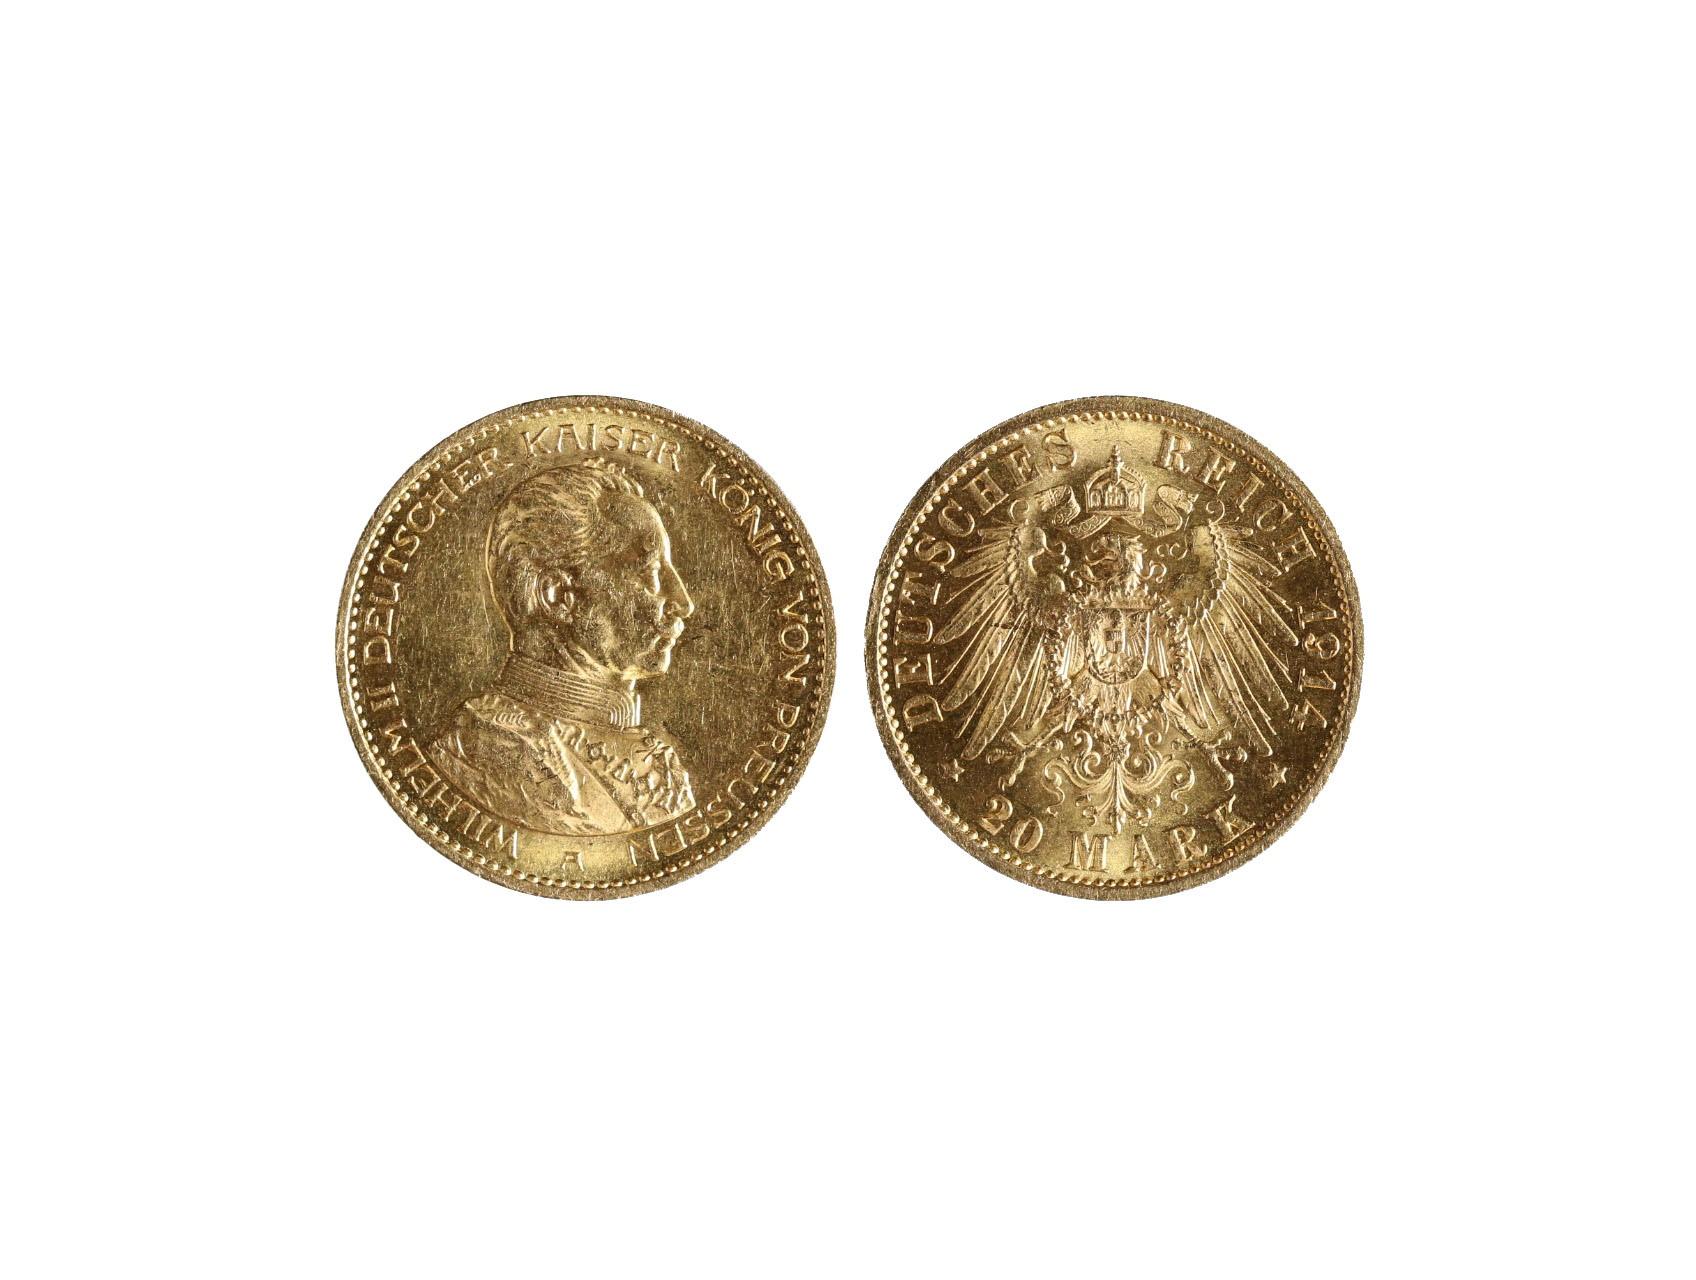 Německo-Prusko, Wilhelm II. 1888-1918 - 20 Marka 1904 A